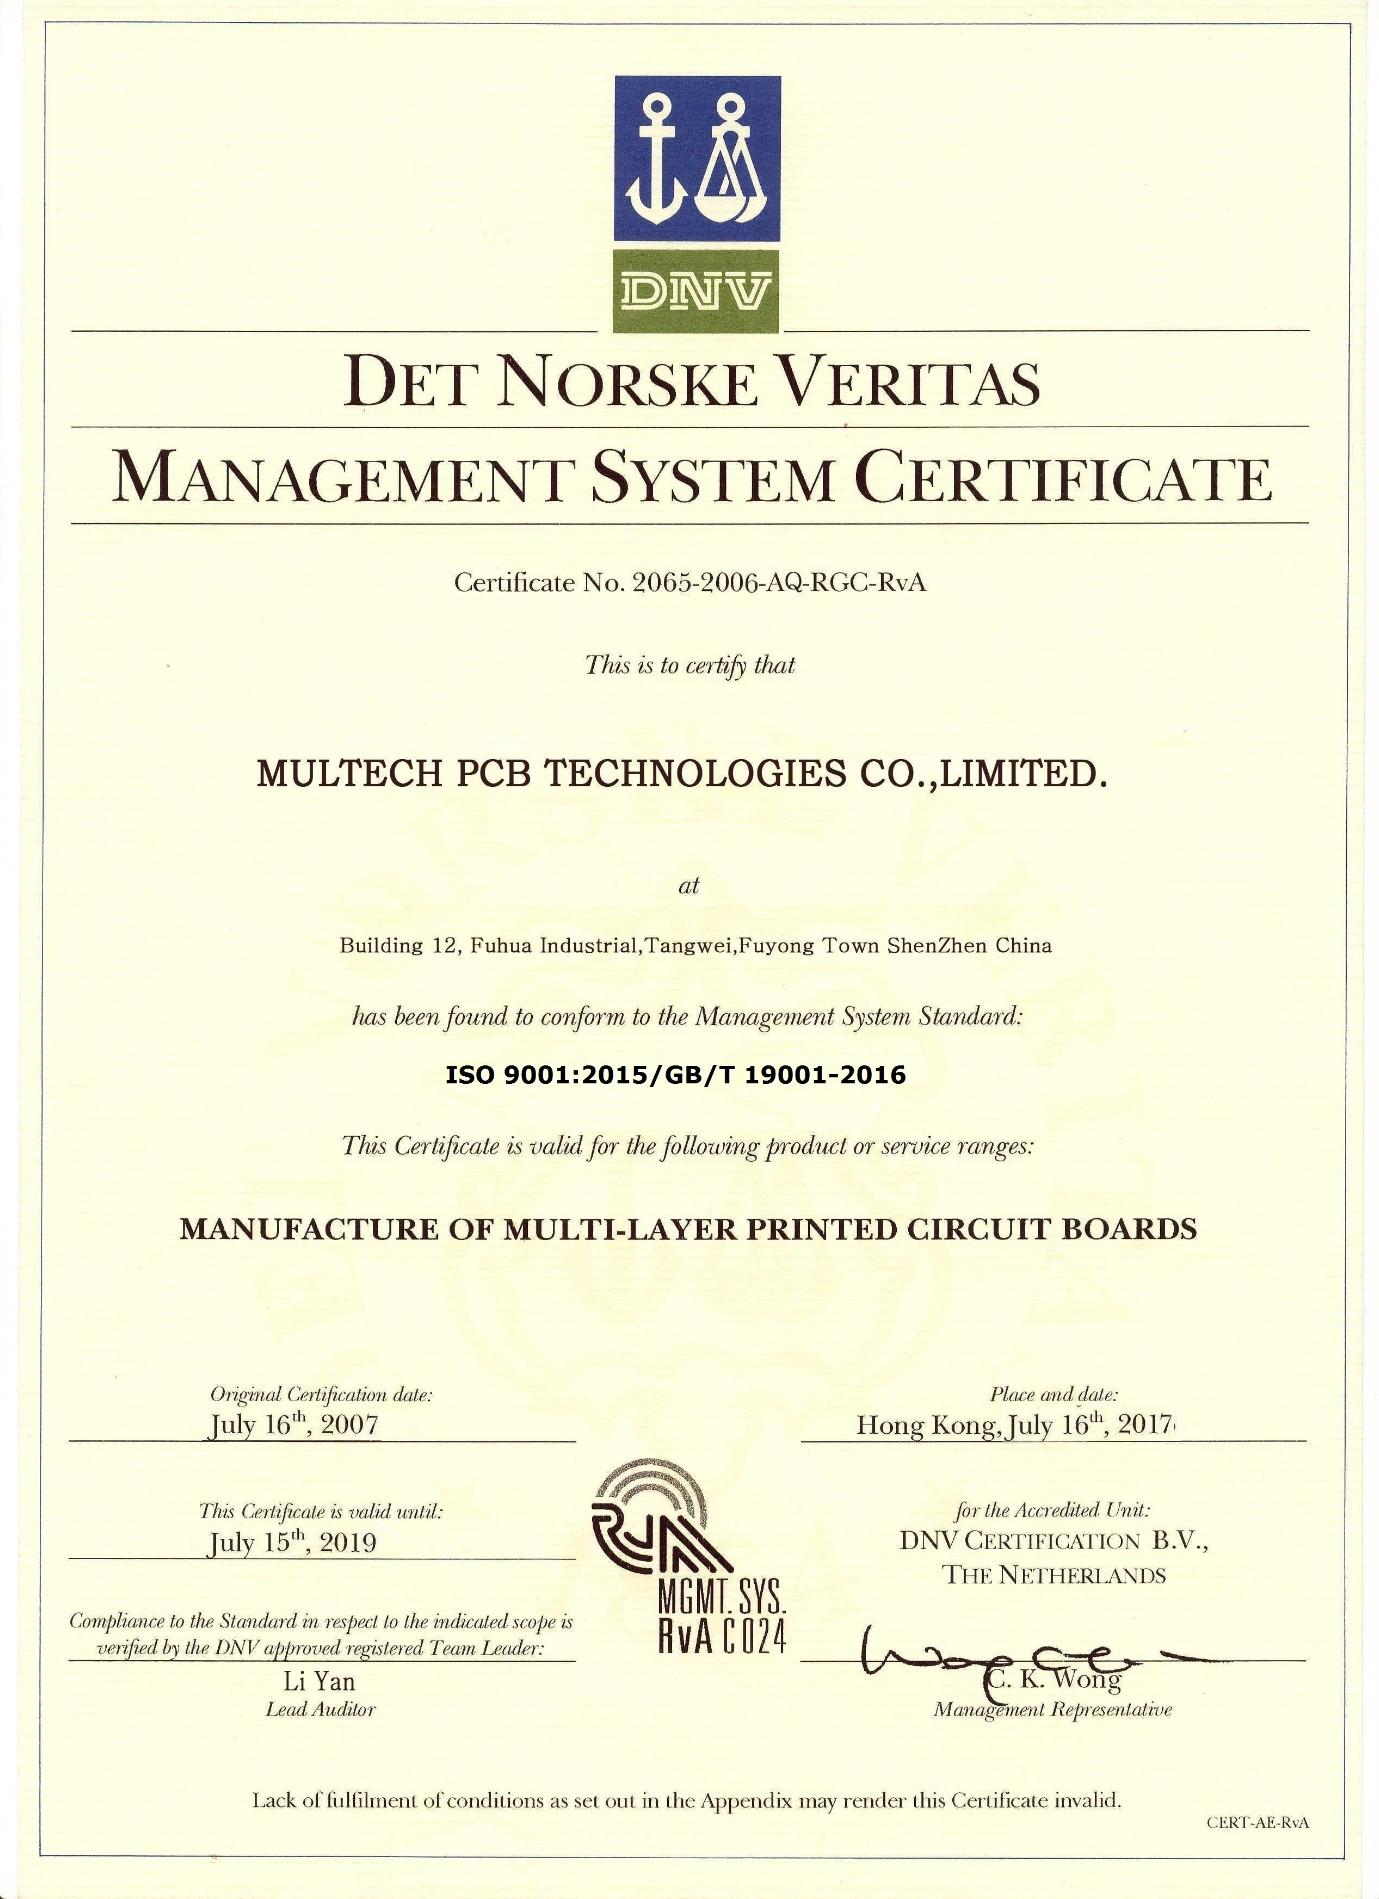 Multech ISO 9001